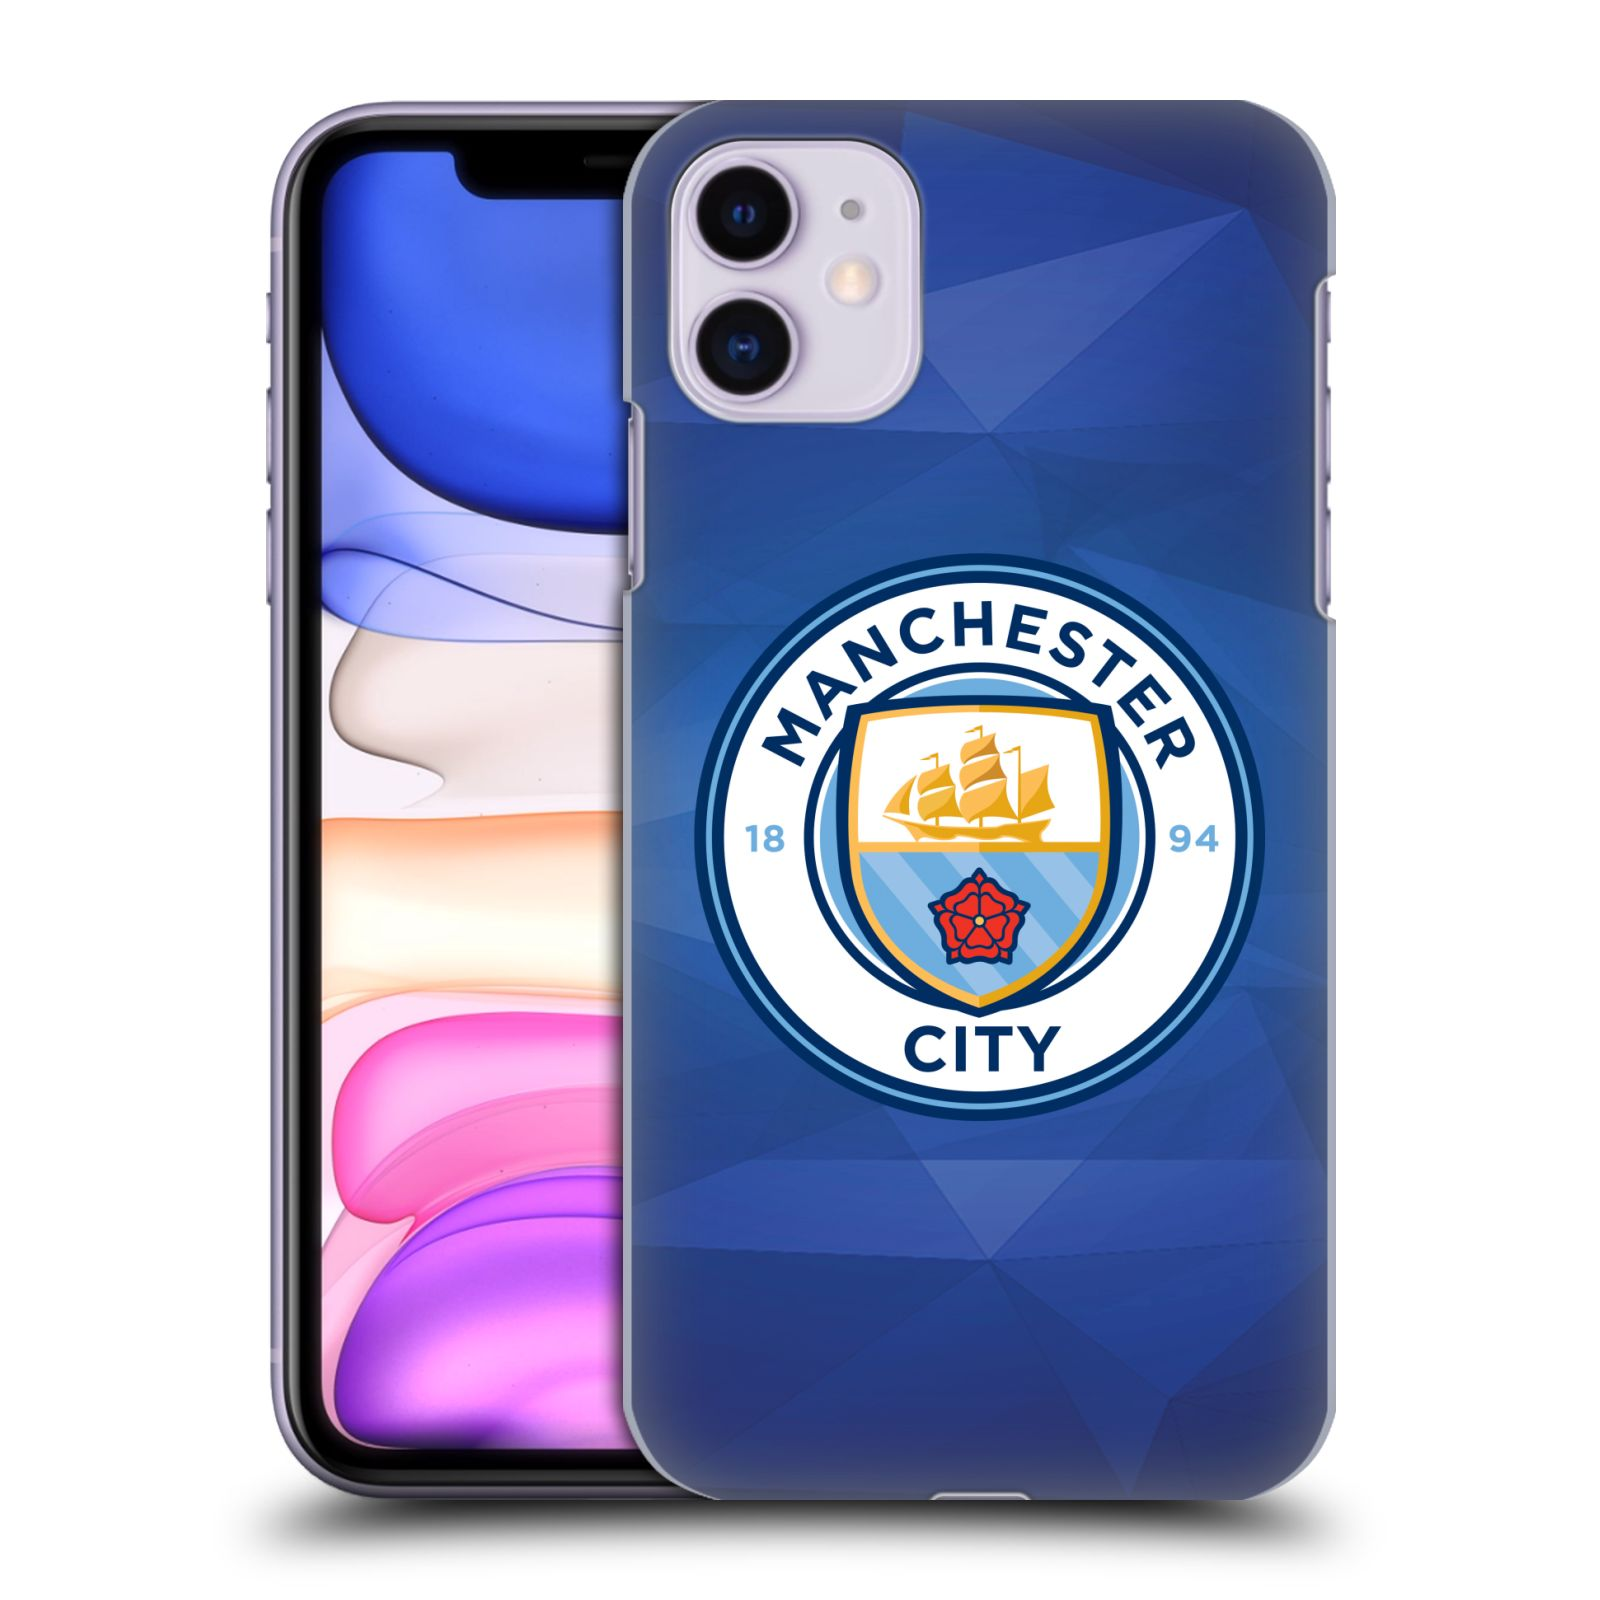 Plastové pouzdro na mobil Apple iPhone 11 - Head Case - Manchester City FC - Modré nové logo